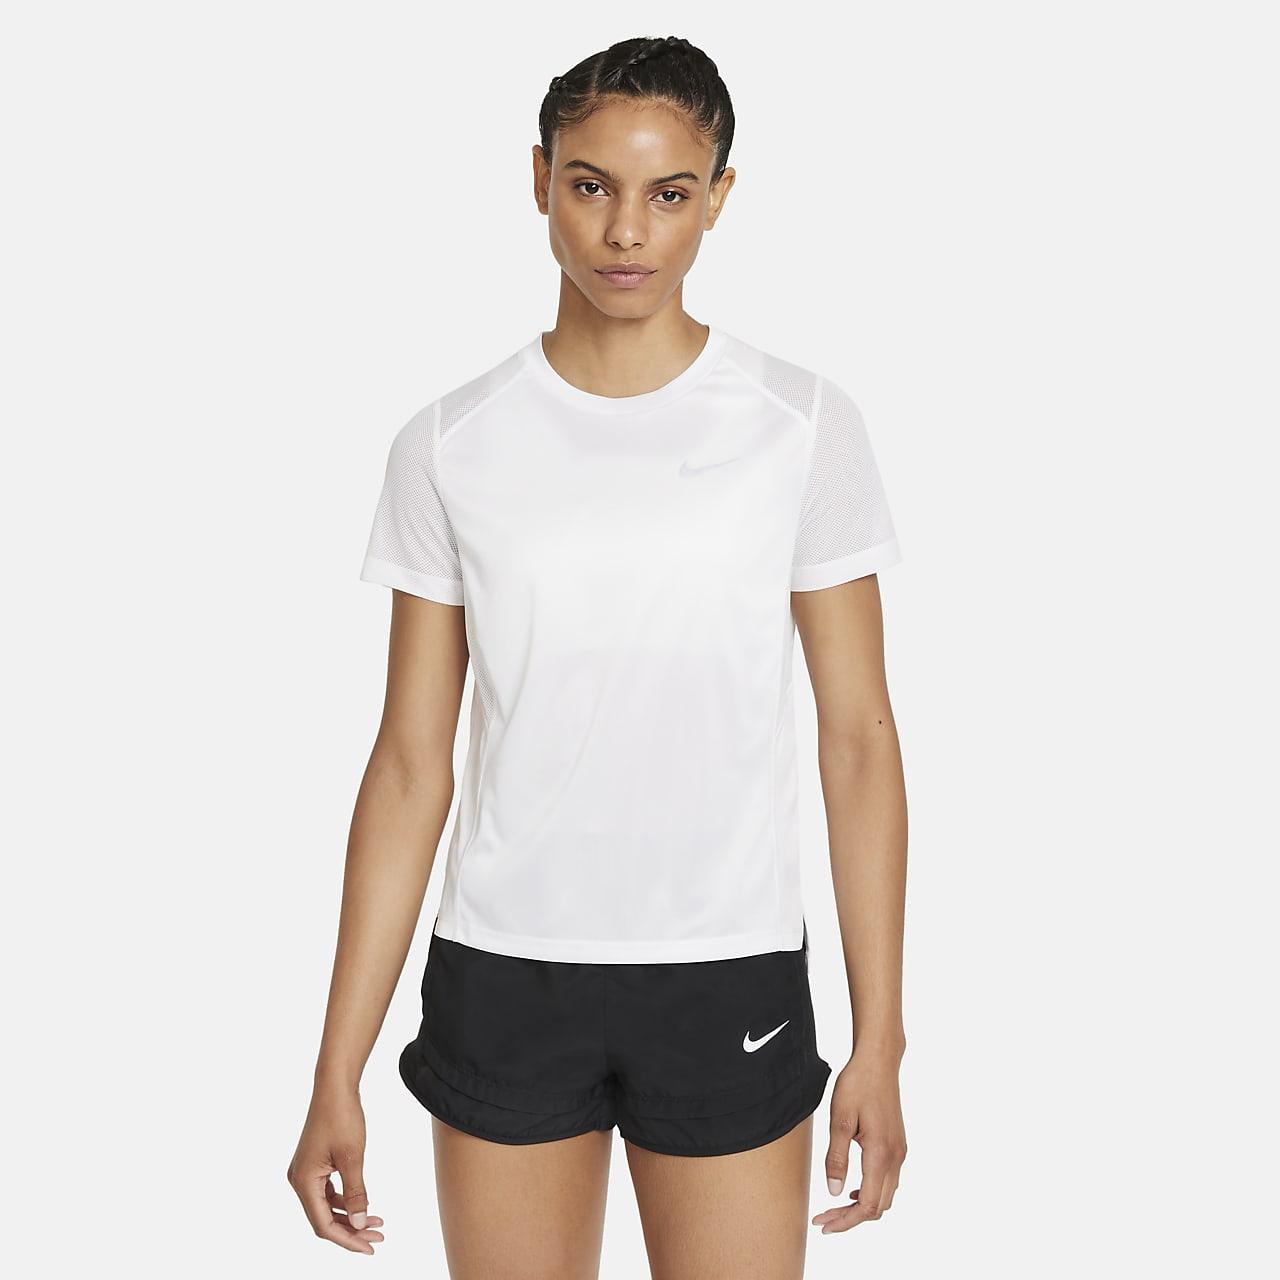 Parte superior de running para mujer Nike Dri-FIT Miler